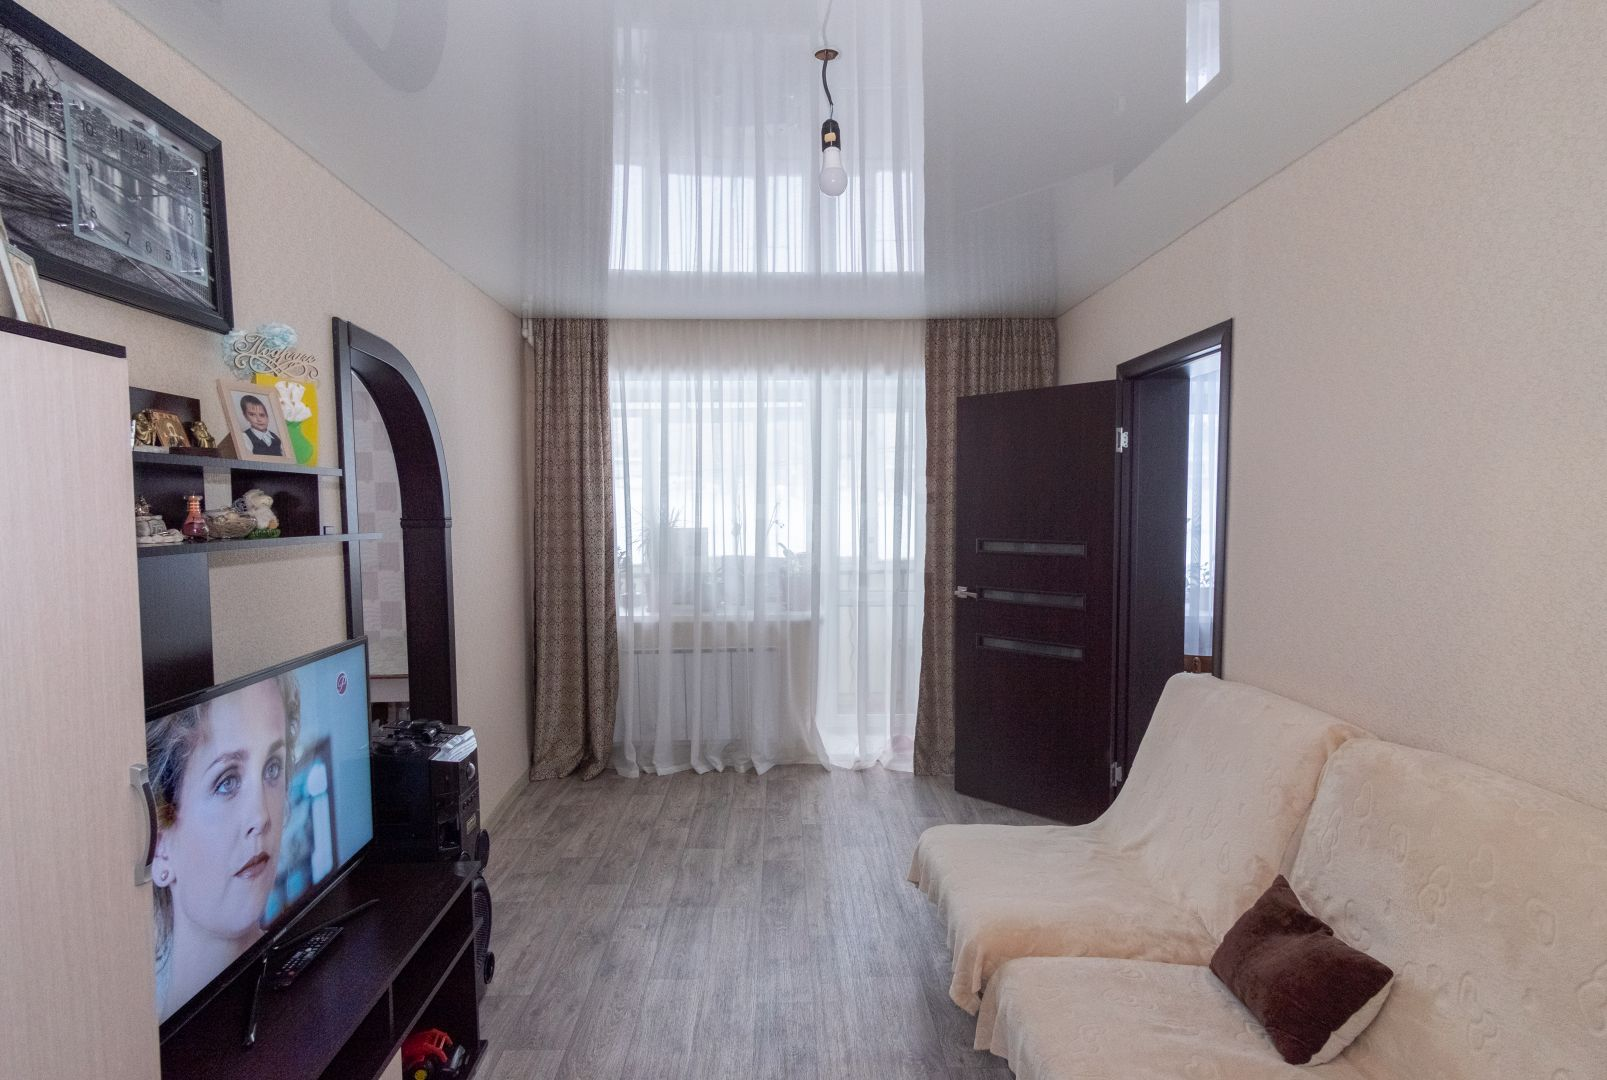 Продается двухкомнатная квартира за 1 230 000 рублей. Машзавод, ул. Грибоедова, д. 9 (7 км до центра).